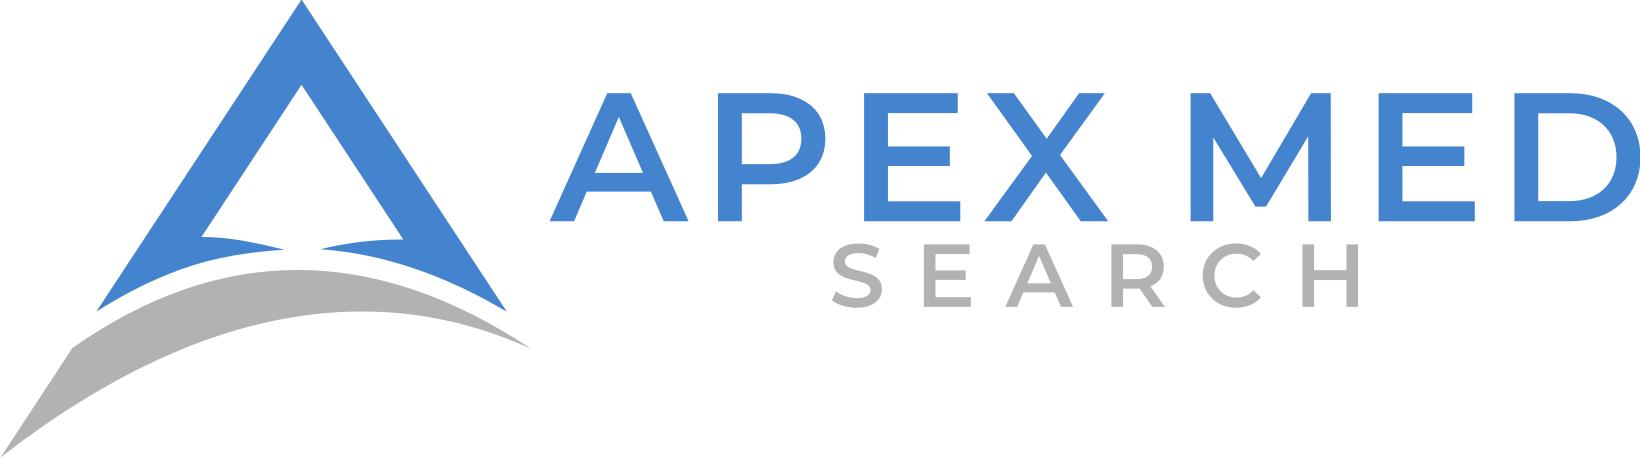 Apex Med Search Logo